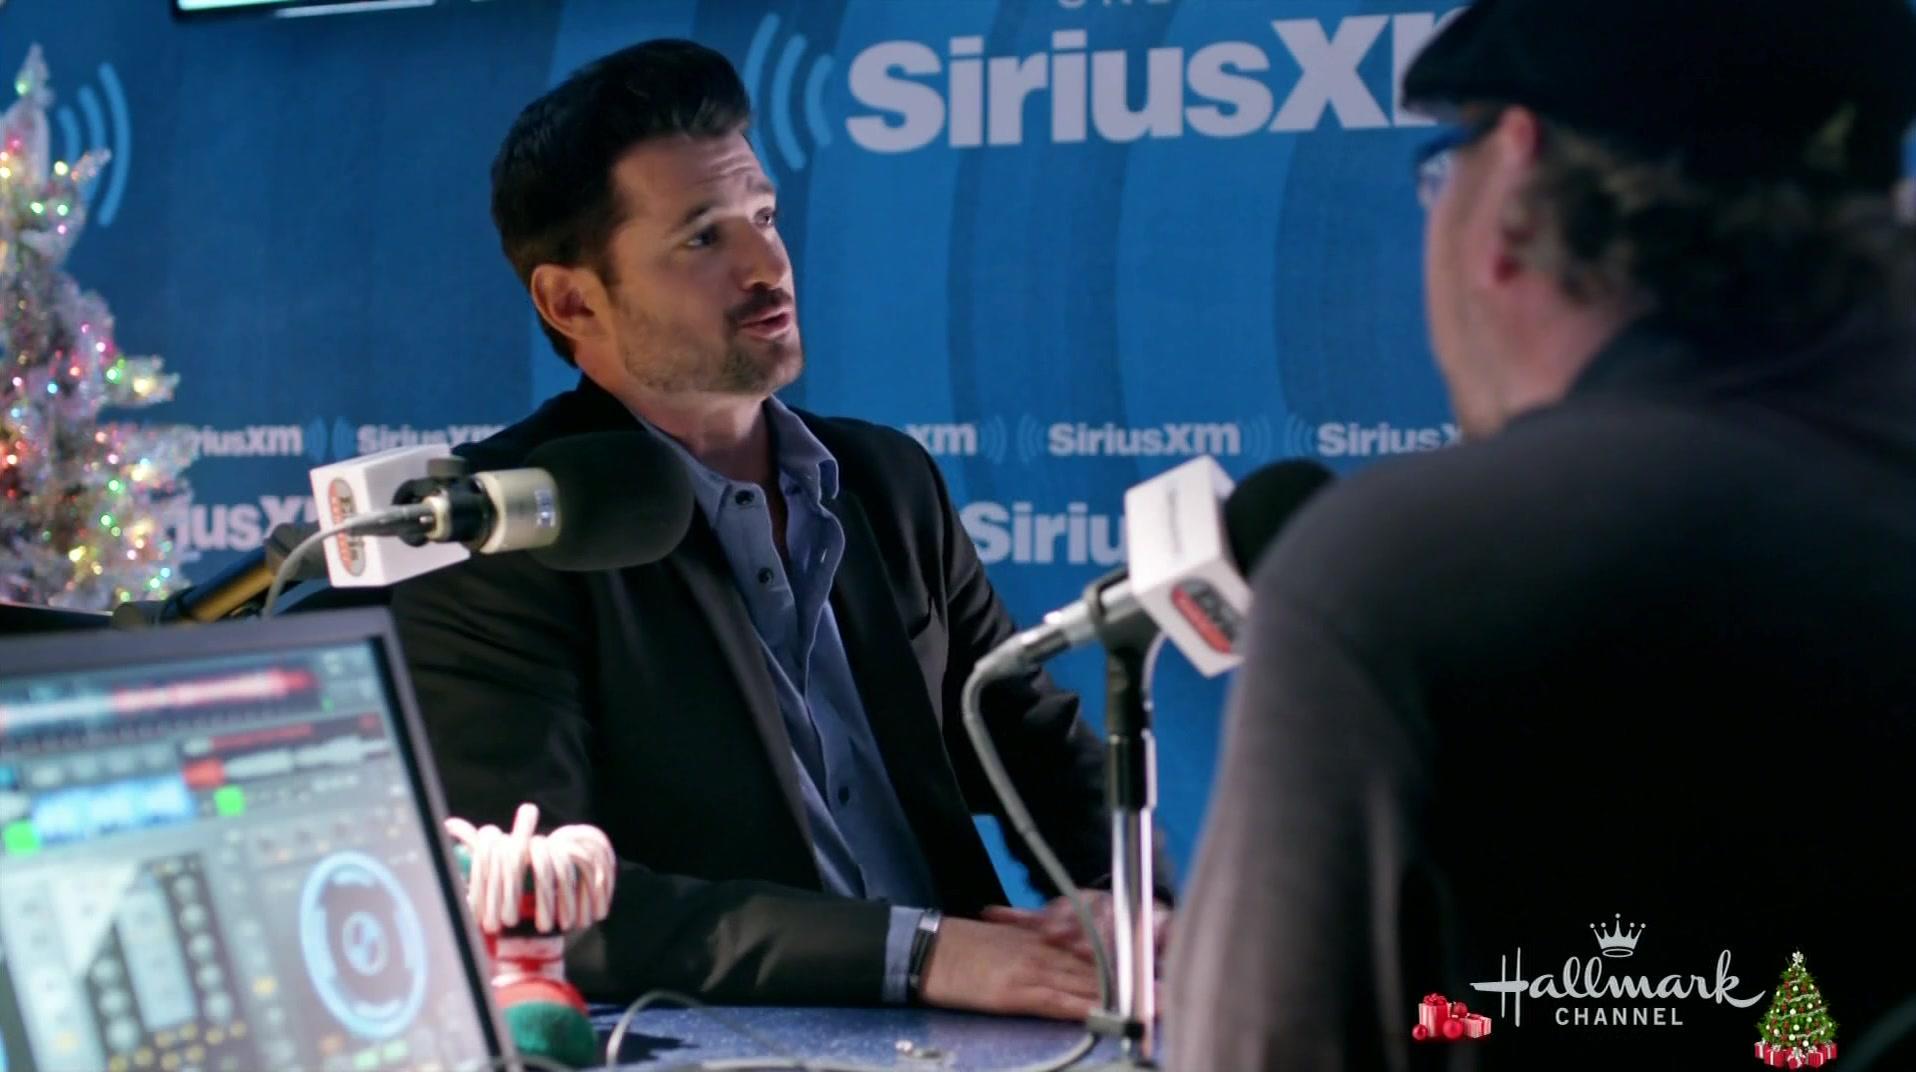 Xm Radio Christmas Station.Sirius Xm Radio Station In Christmas At Graceland 2018 Movie